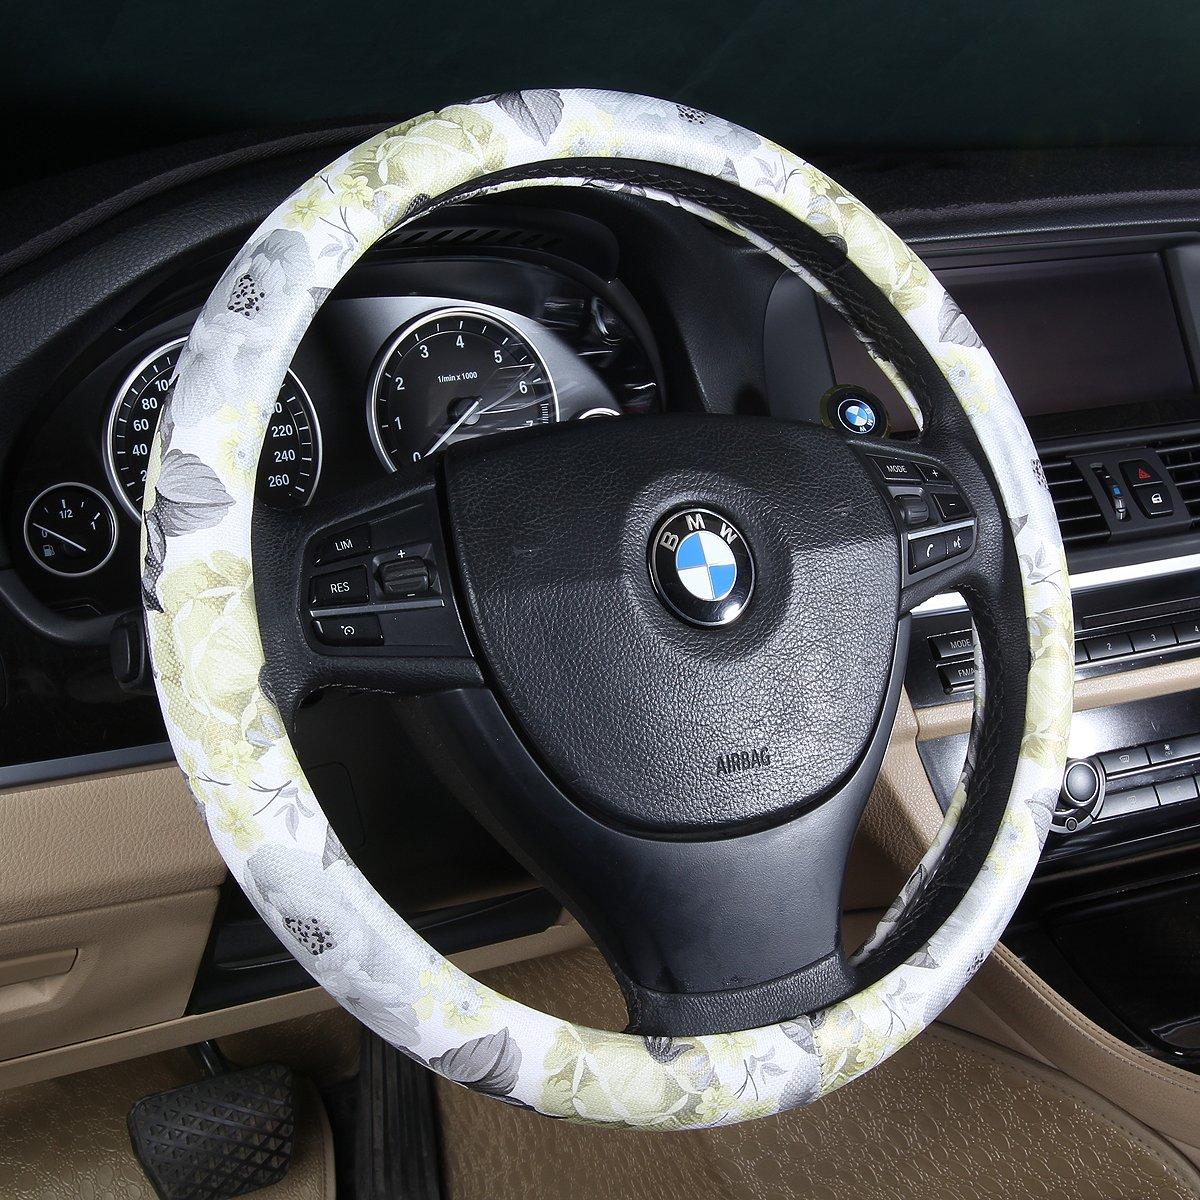 BINSHEO PU Leather Auto Car Steering Wheel Cover Women Girls Ladies, Anti Slip Non-Toxic Universal 15 inch, Chinese Style, Black Flowers